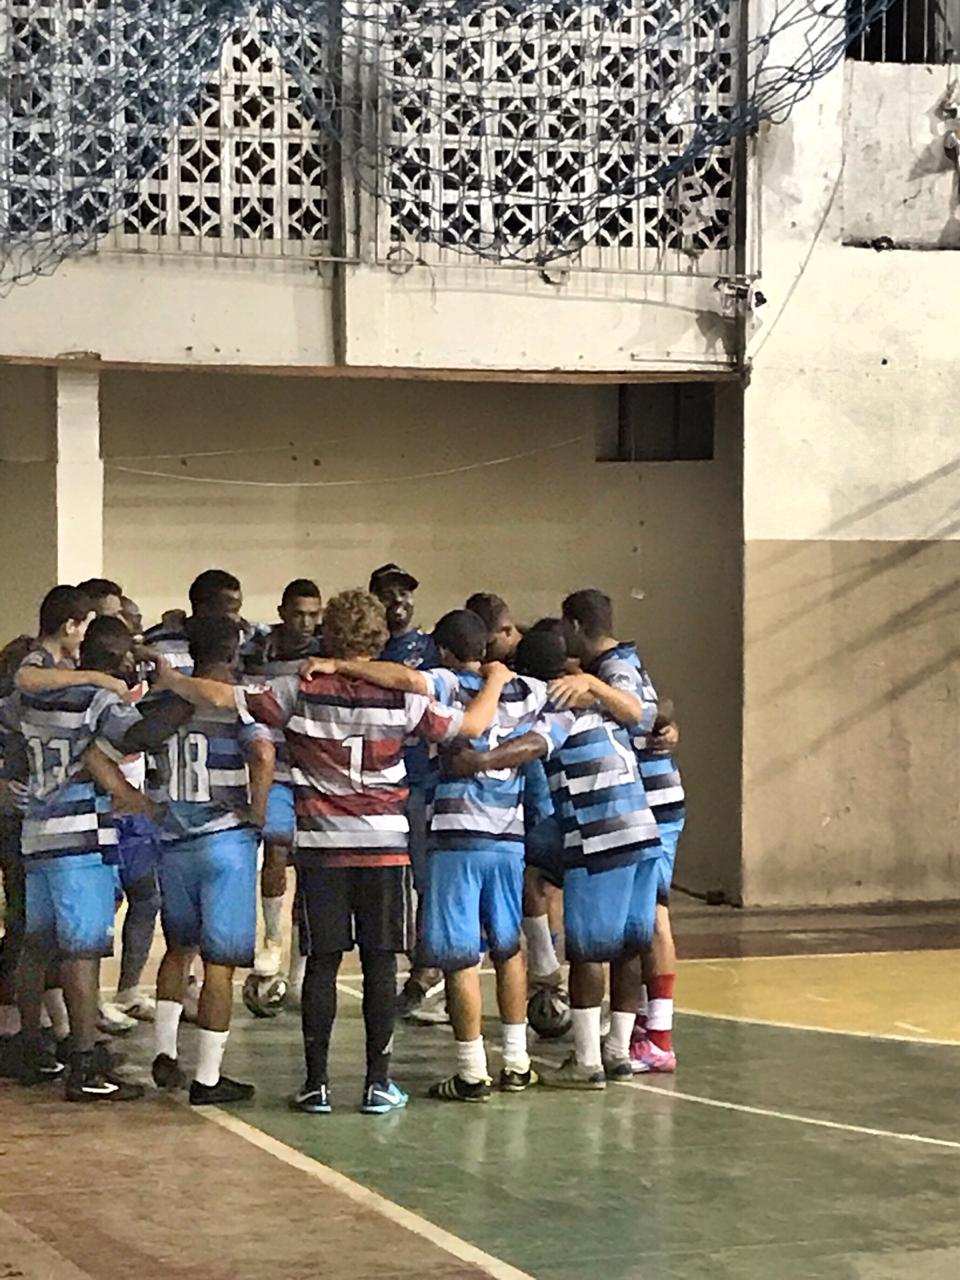 f393bf95f2 Laje Futsal vence Itaperuna em amistoso em Laje do Muriaé